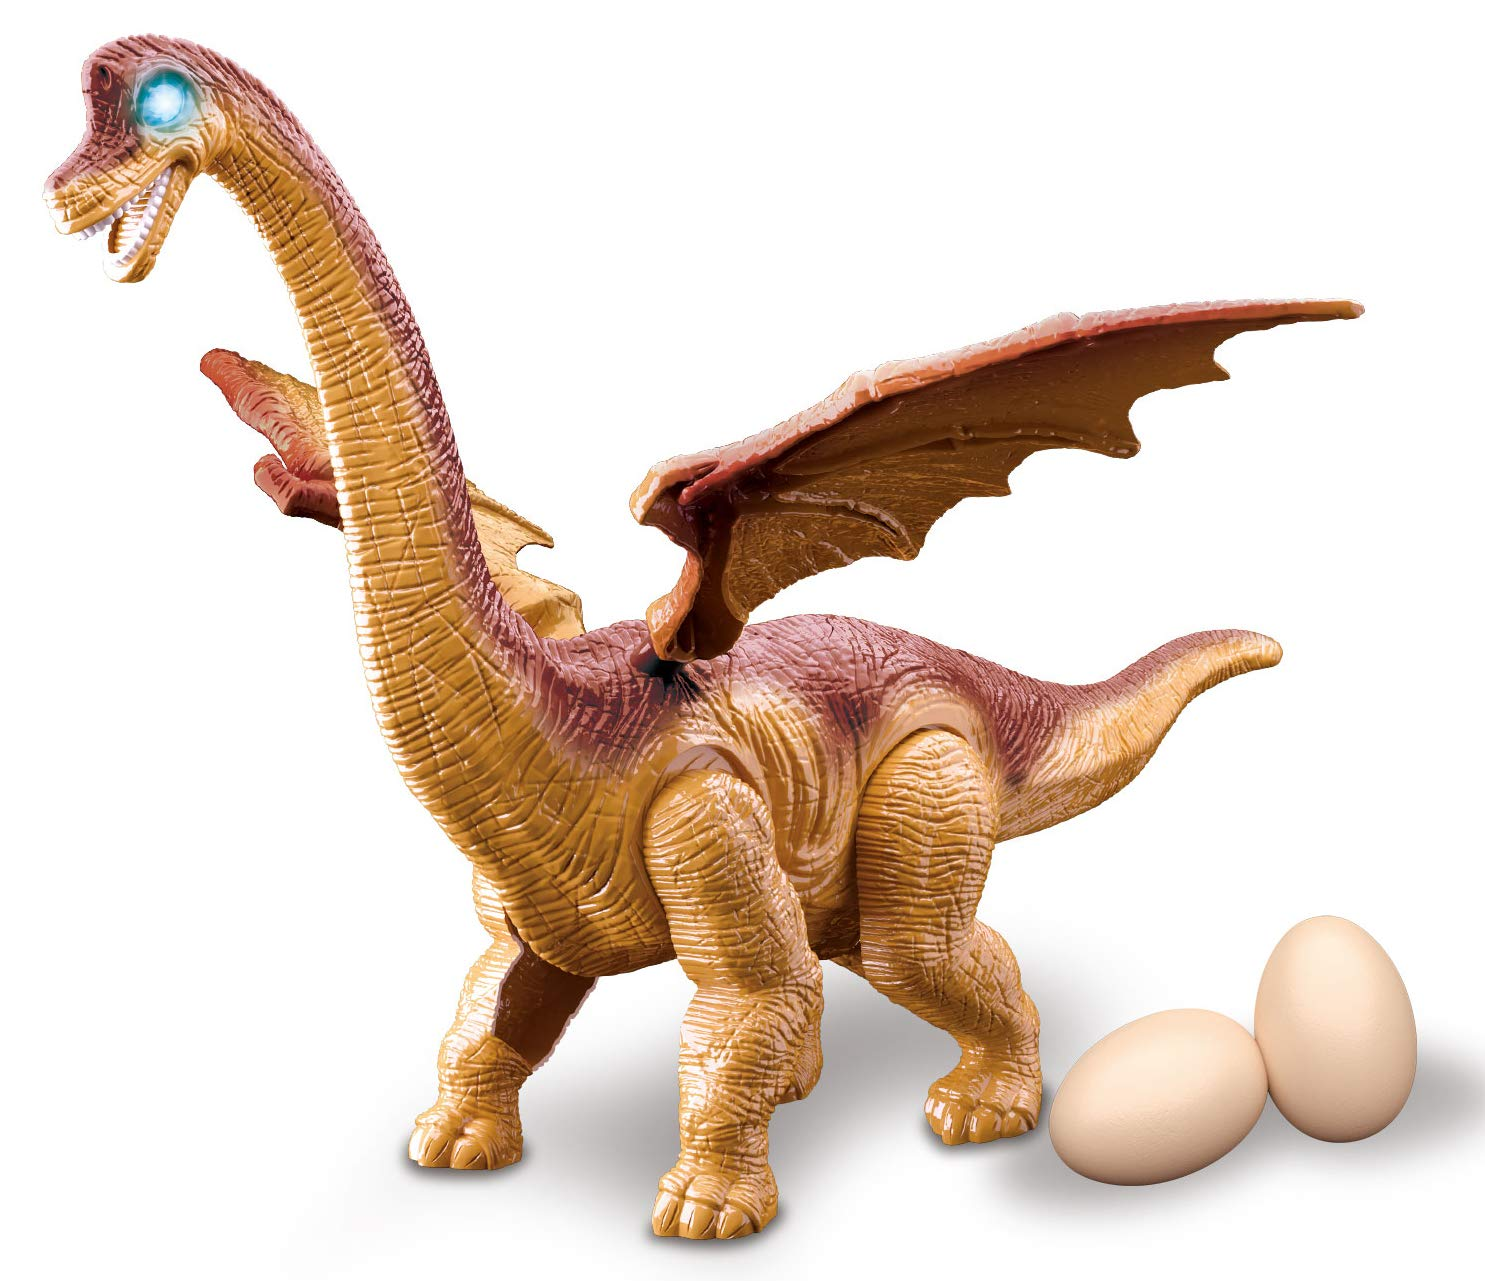 PowerTRC Walking Brachiosaurus Toy Dinosaur Makes Sounds and Even Lay Eggs by PowerTRC (Image #2)